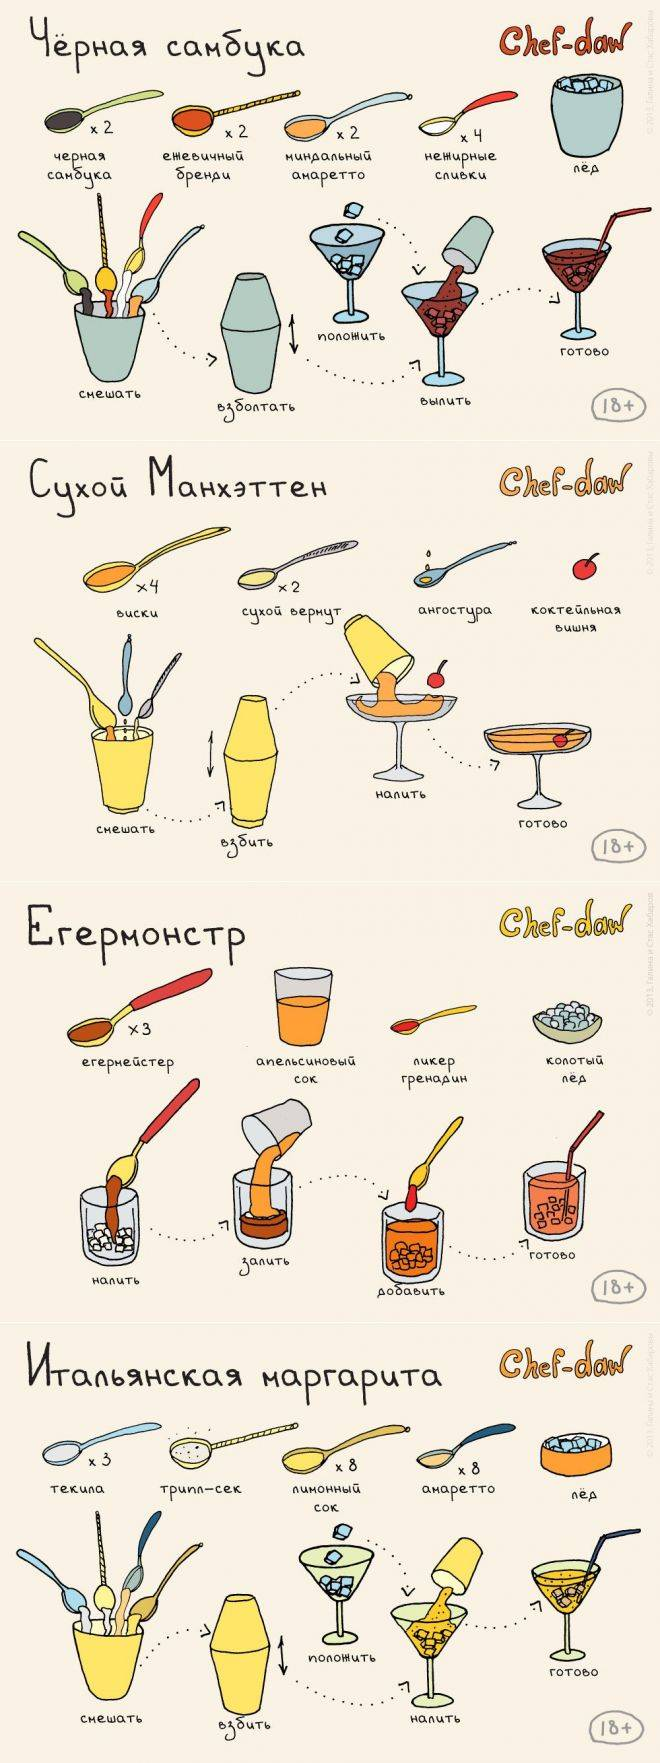 Rusty nail (коктейль) – rusty nail (cocktail)